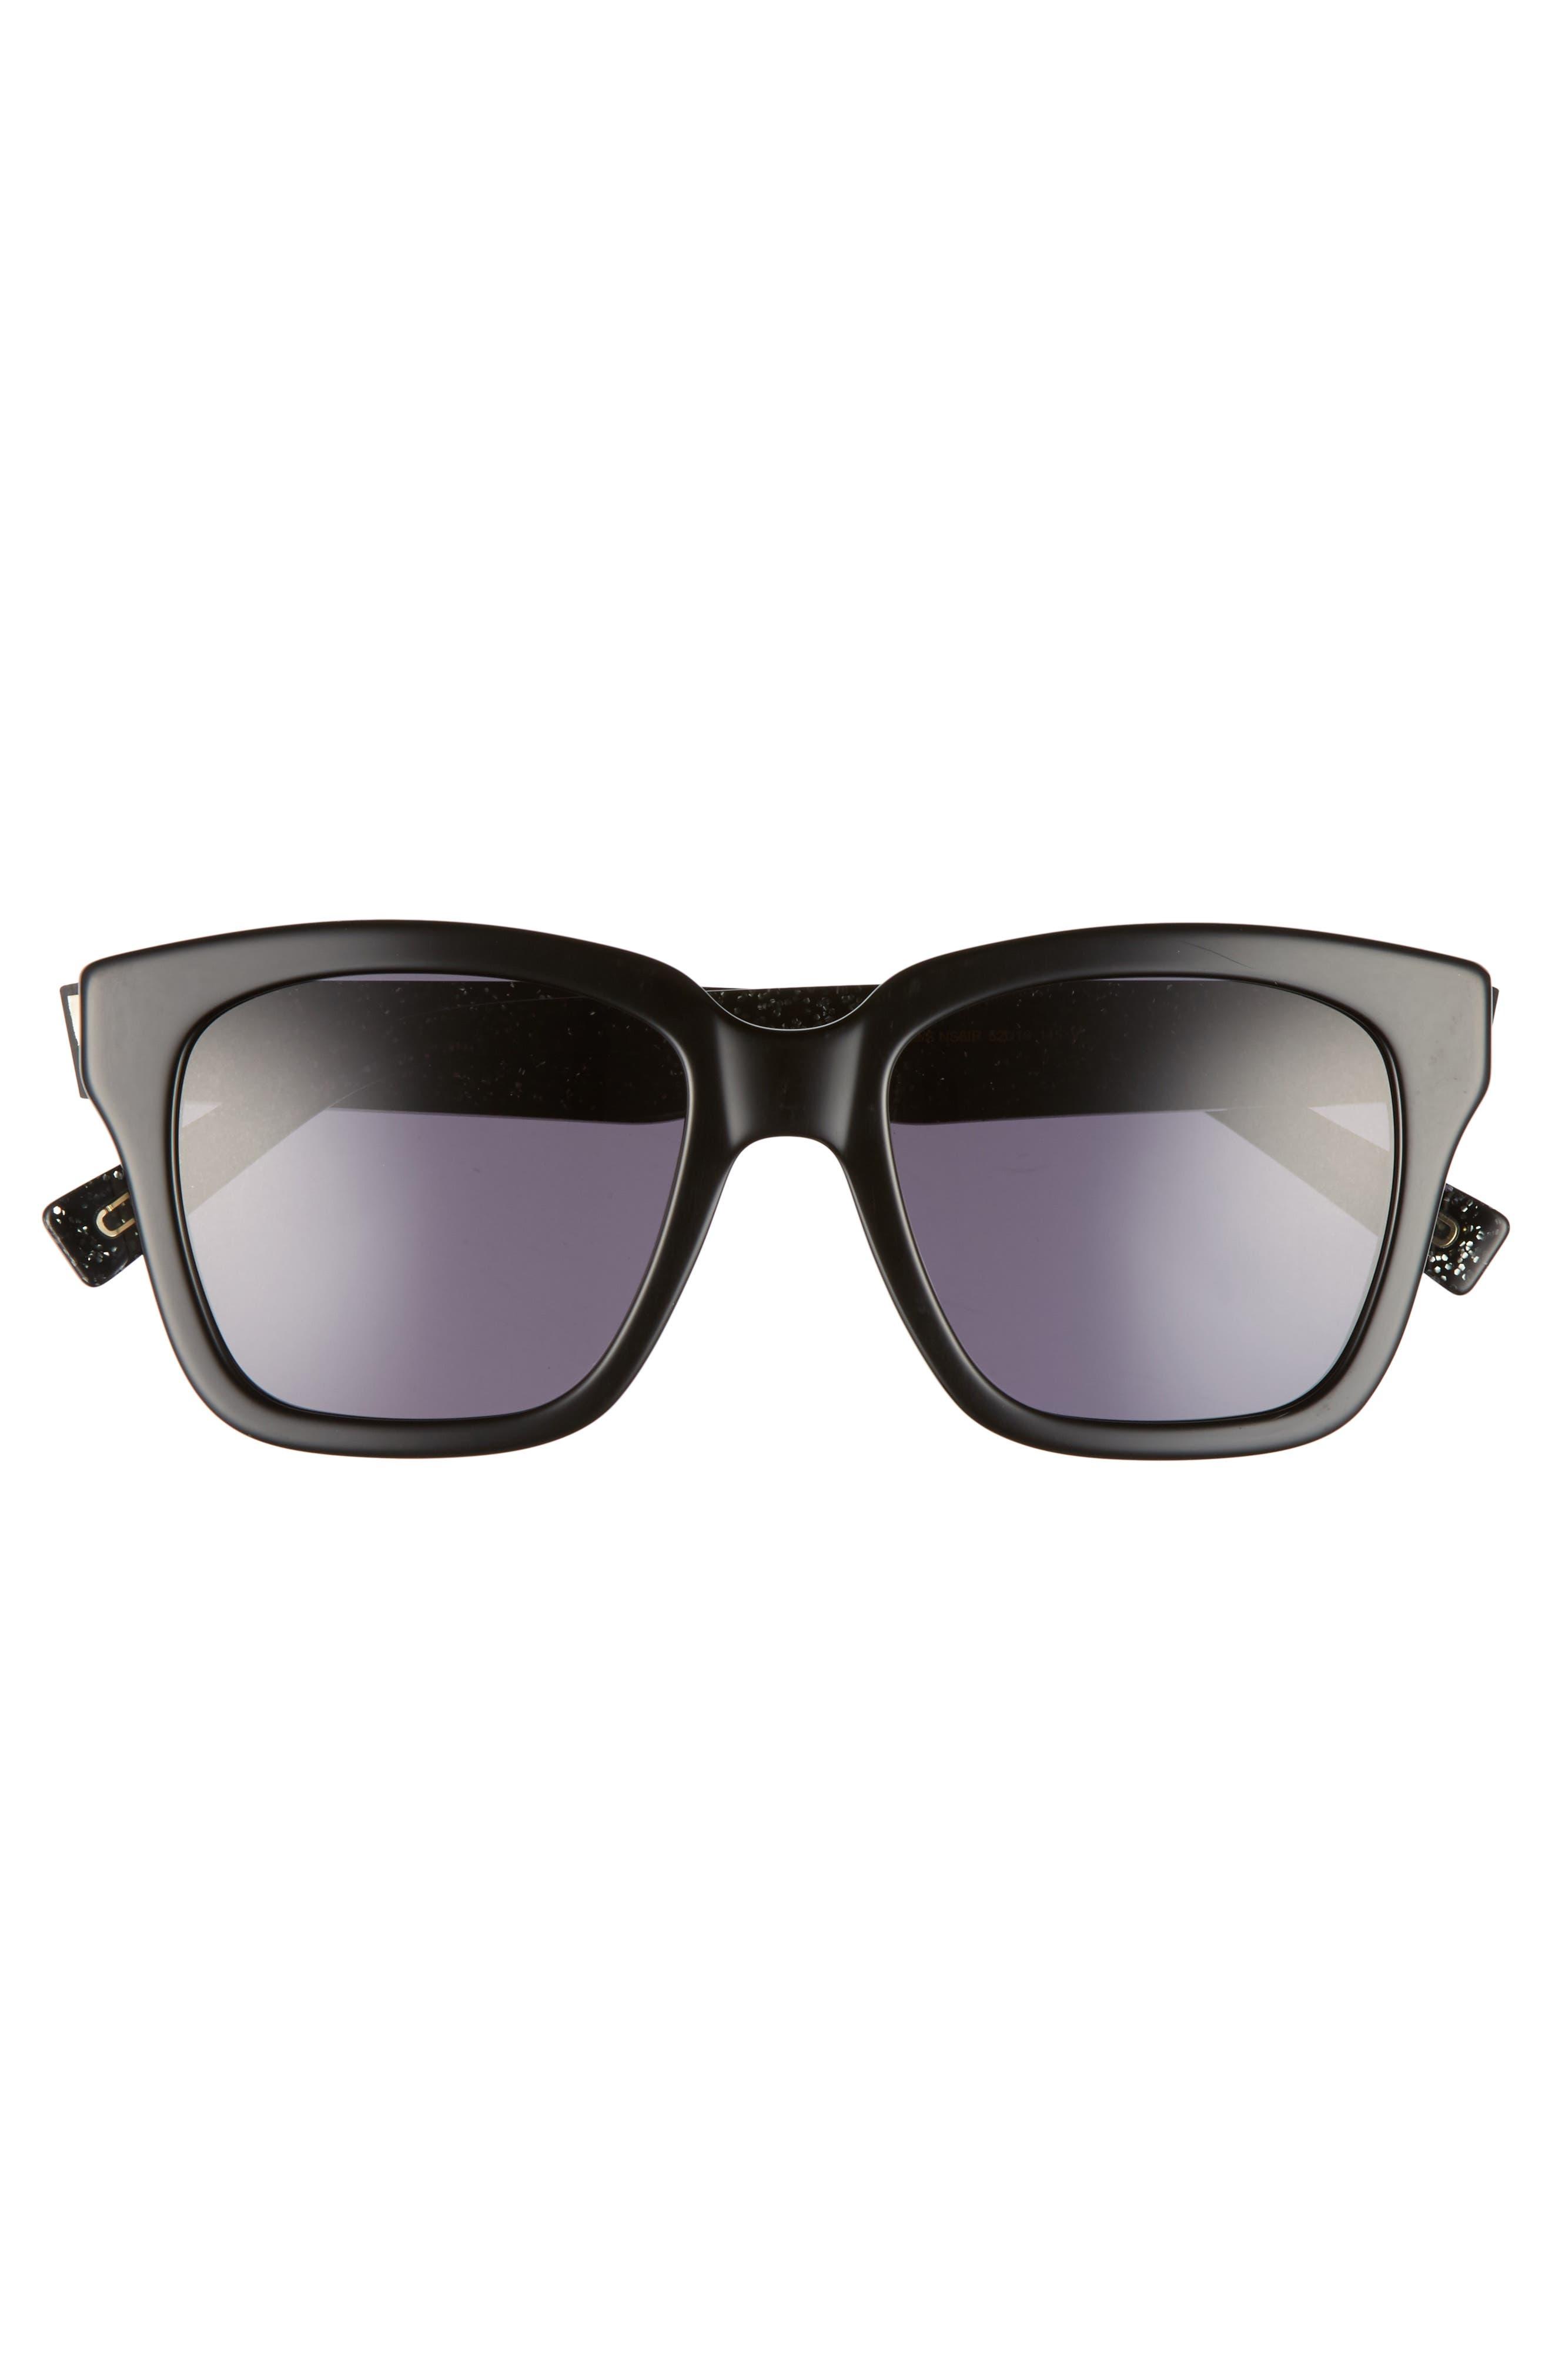 52mm Square Sunglasses,                             Alternate thumbnail 3, color,                             Black Glitter/ Gray Blue